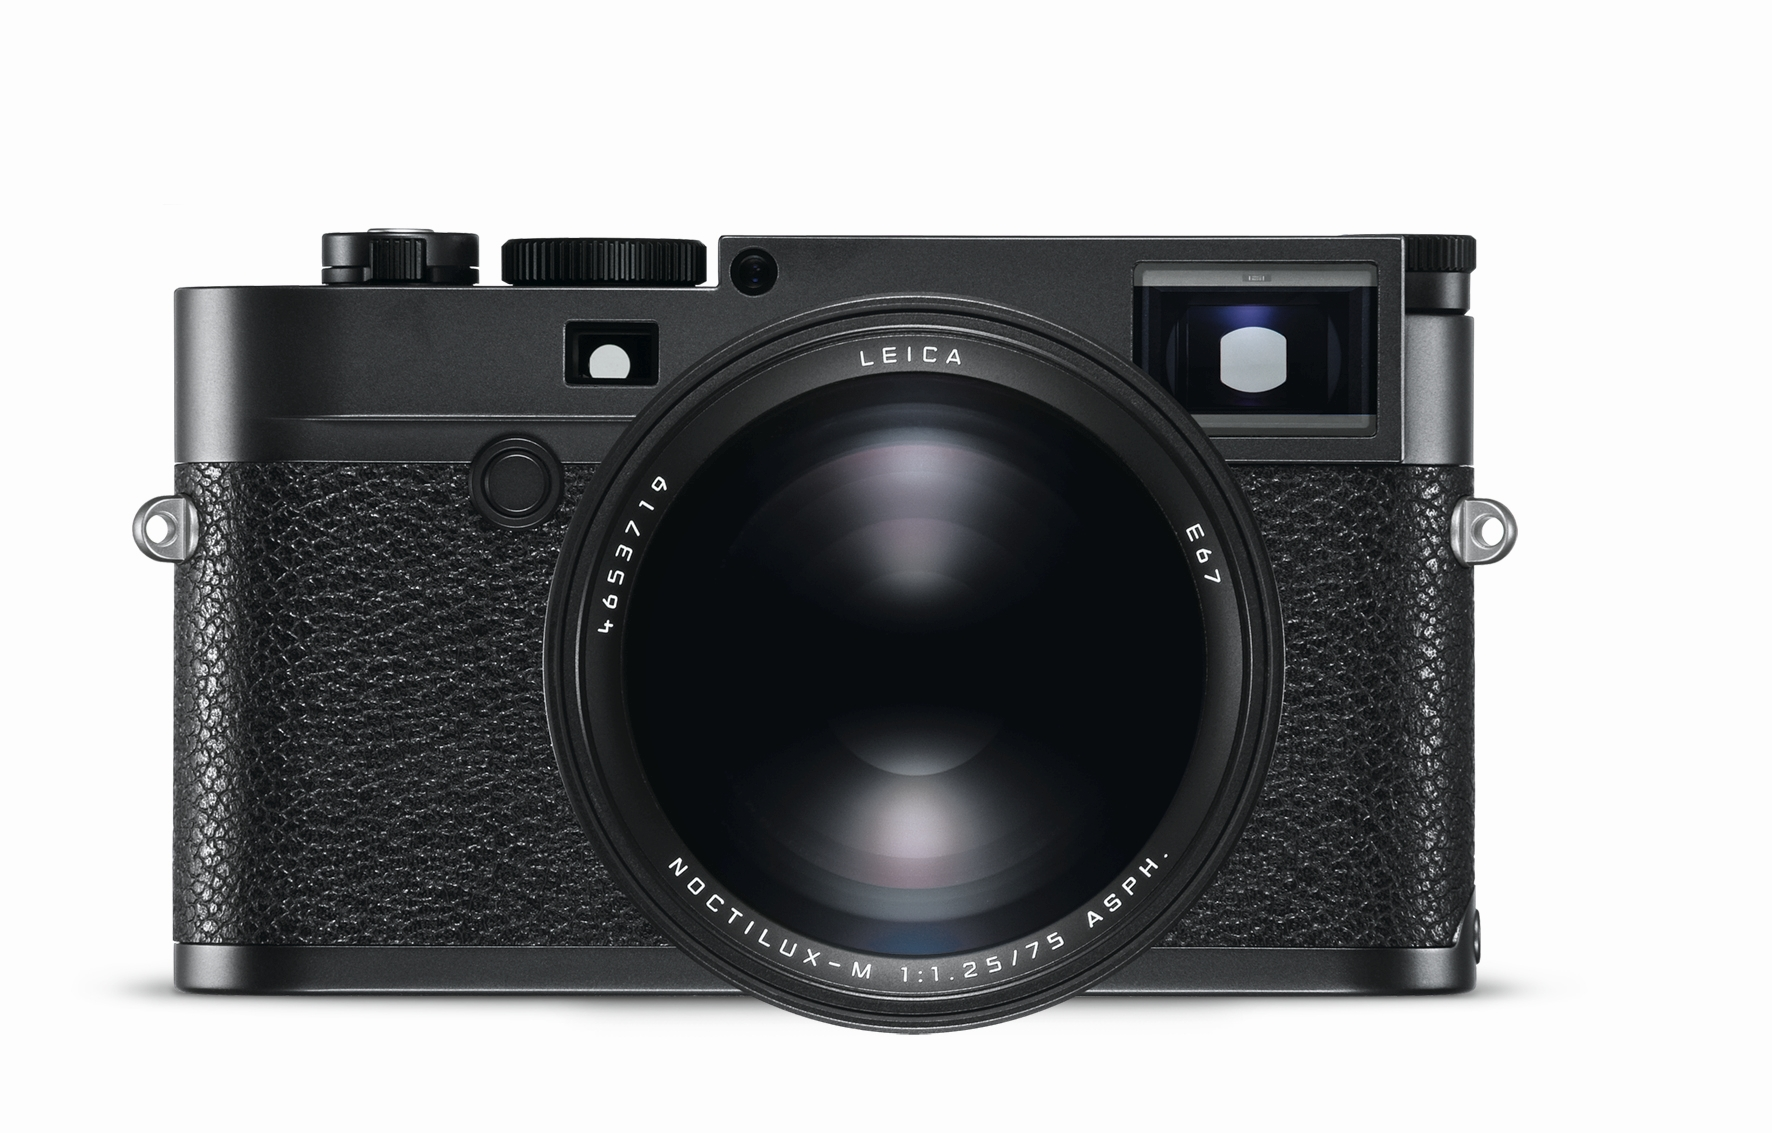 Leica M10_Leica Noctilux-M_1_25_75_ASPH_front_CMYK.jpg